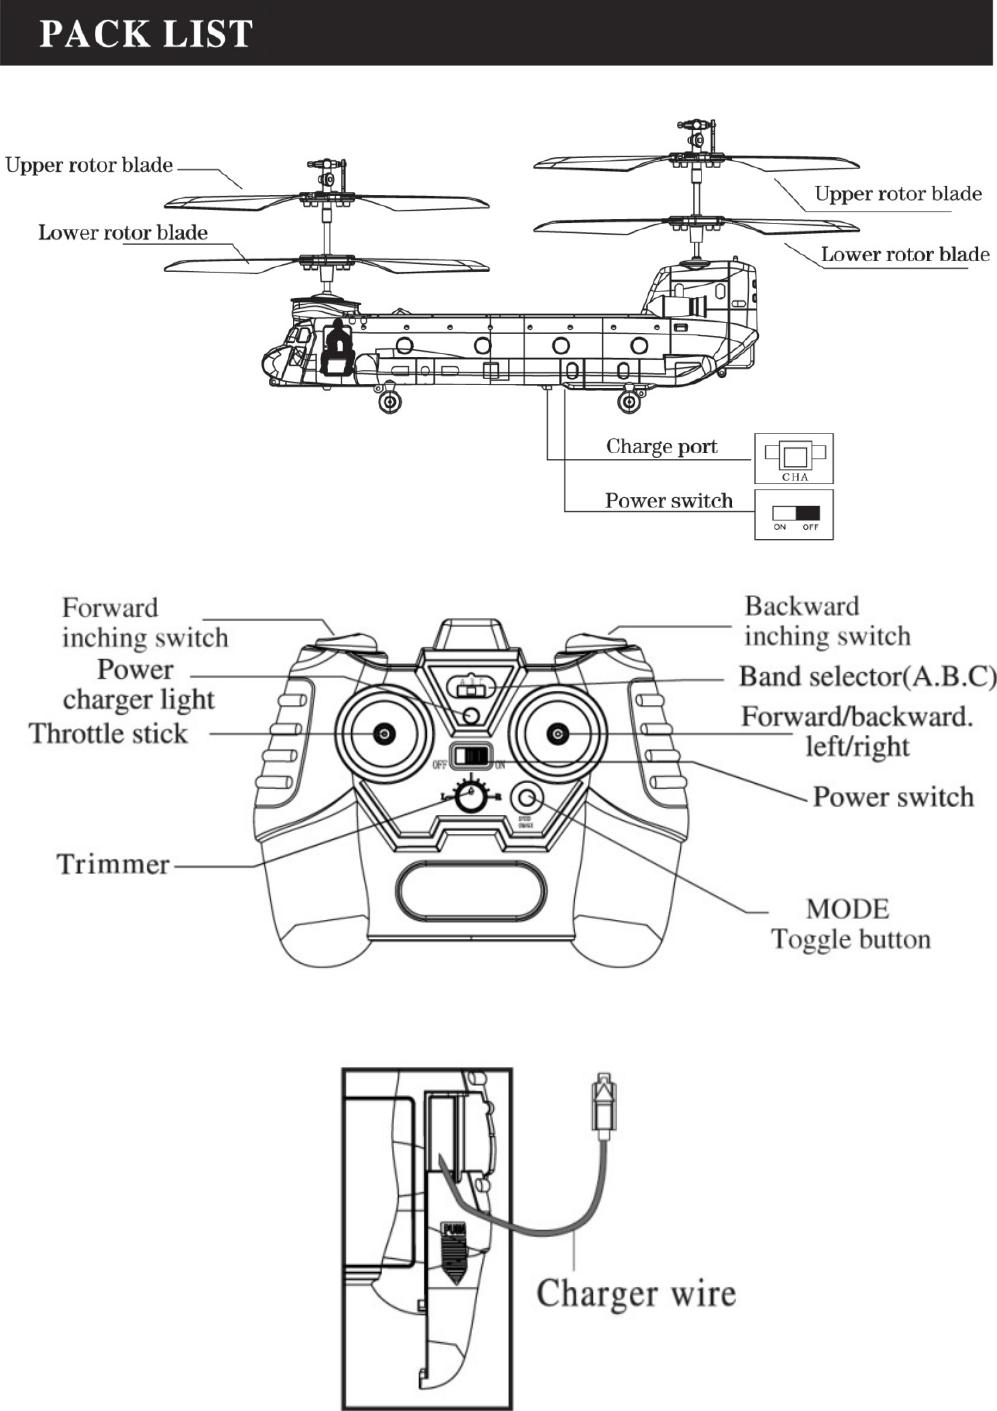 hight resolution of page 2 of 5 kahelchnoka kogan chinook transporter helicopter user manual kahelchnoka a